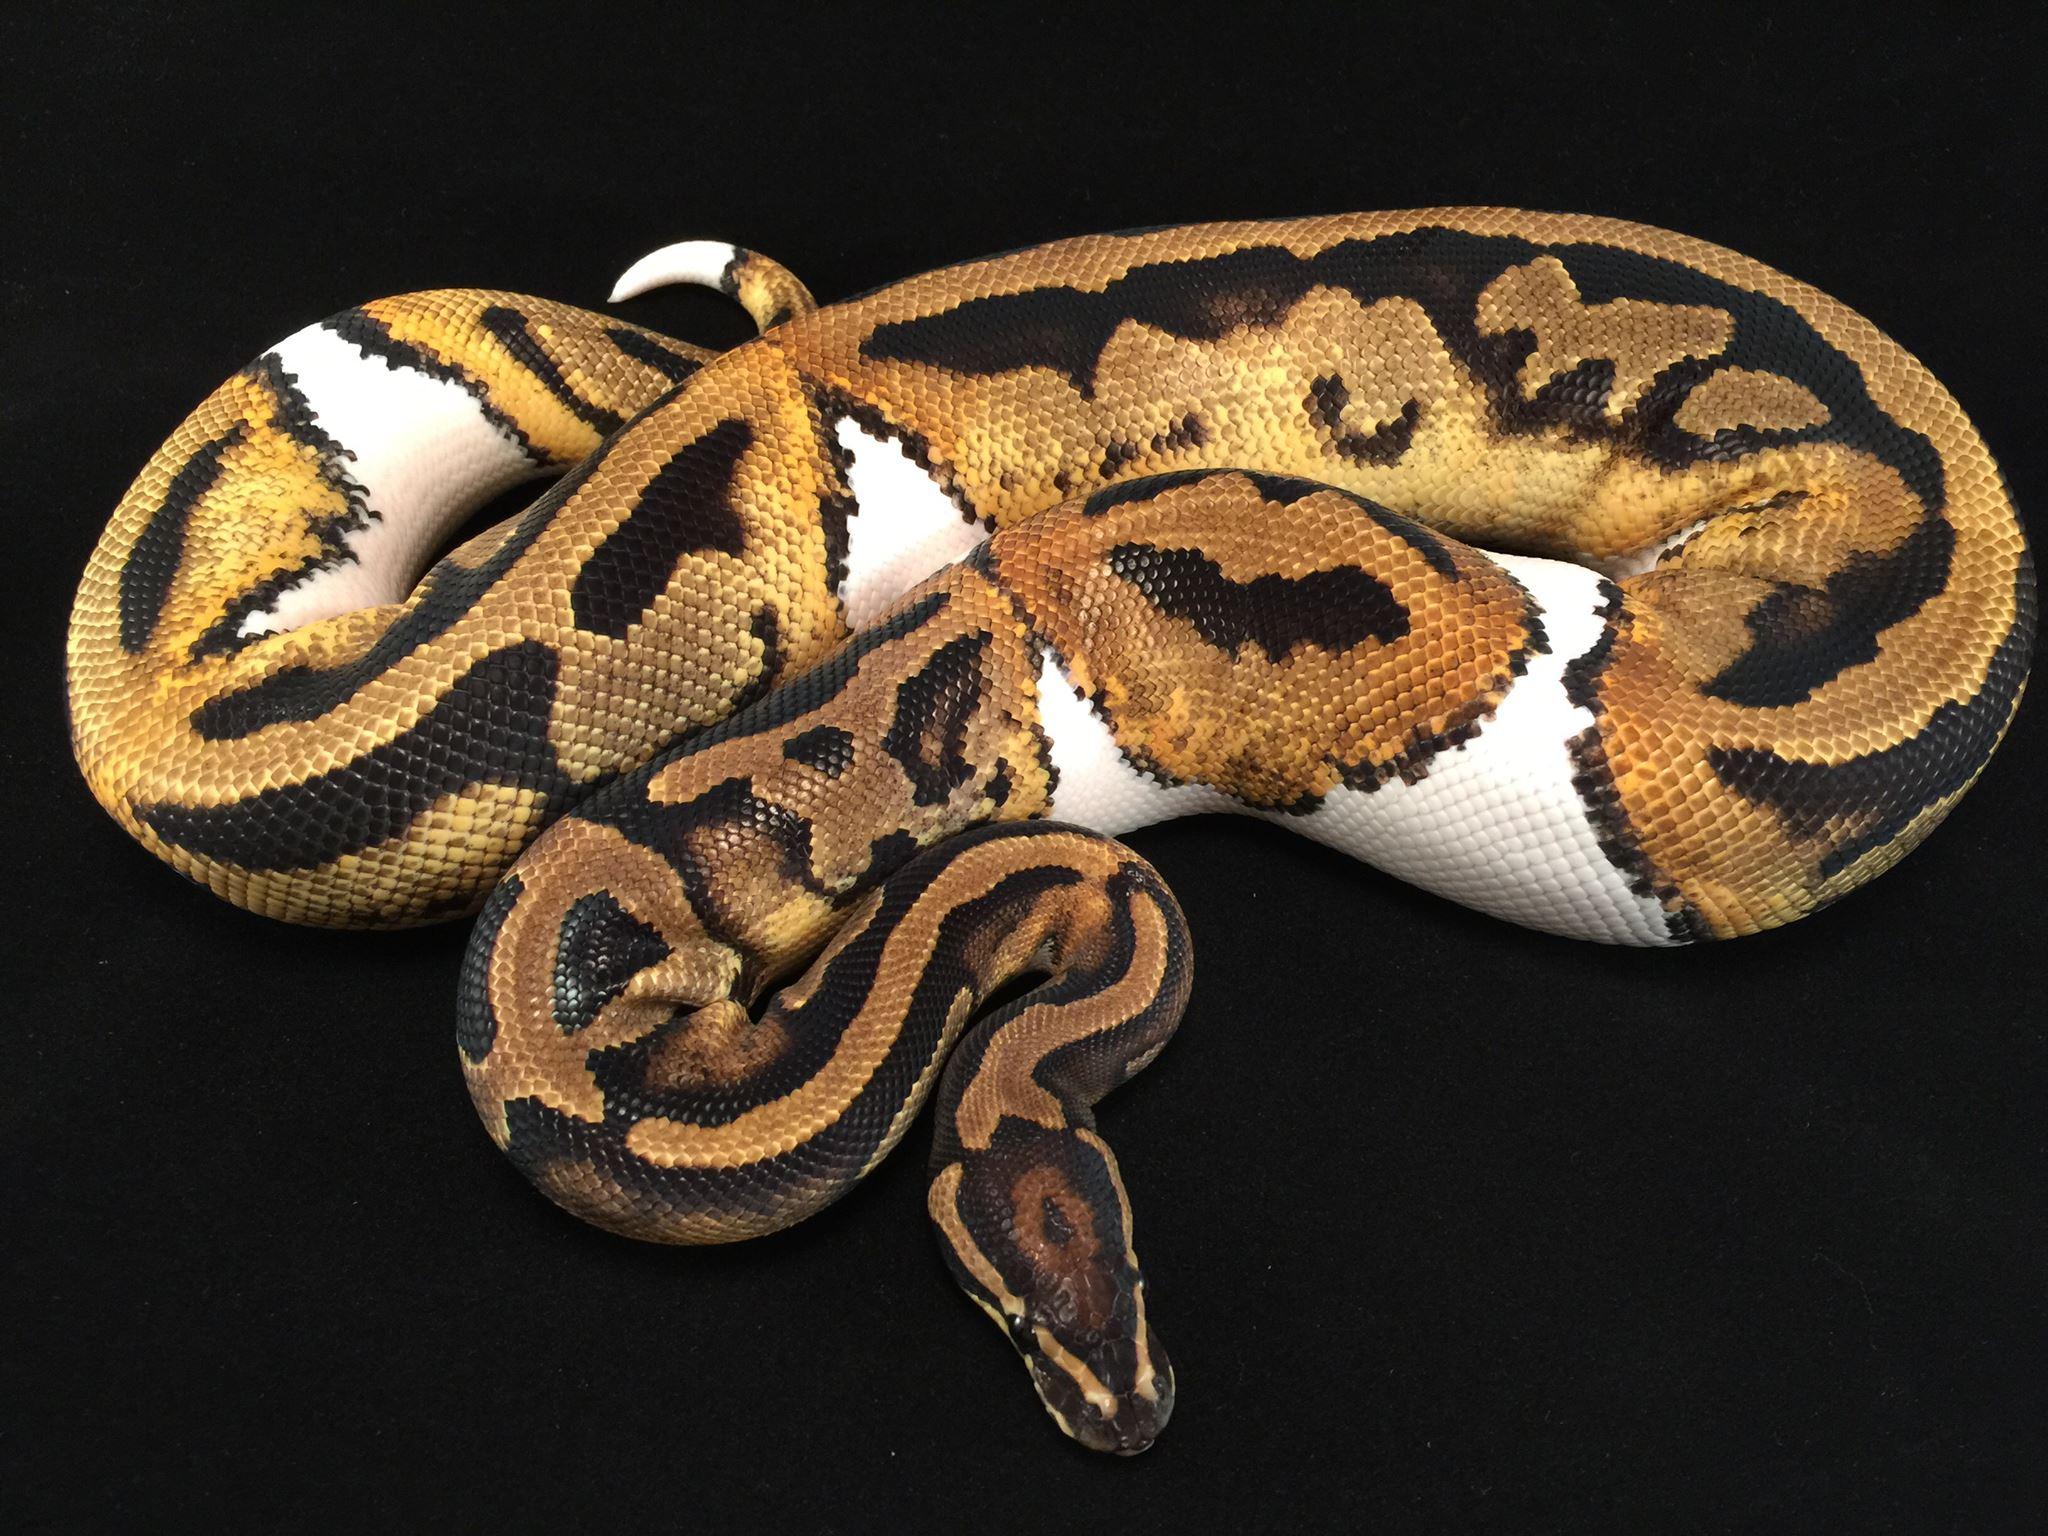 ball pythons in texas, where to buy ball pythons, fort worth ball pythons